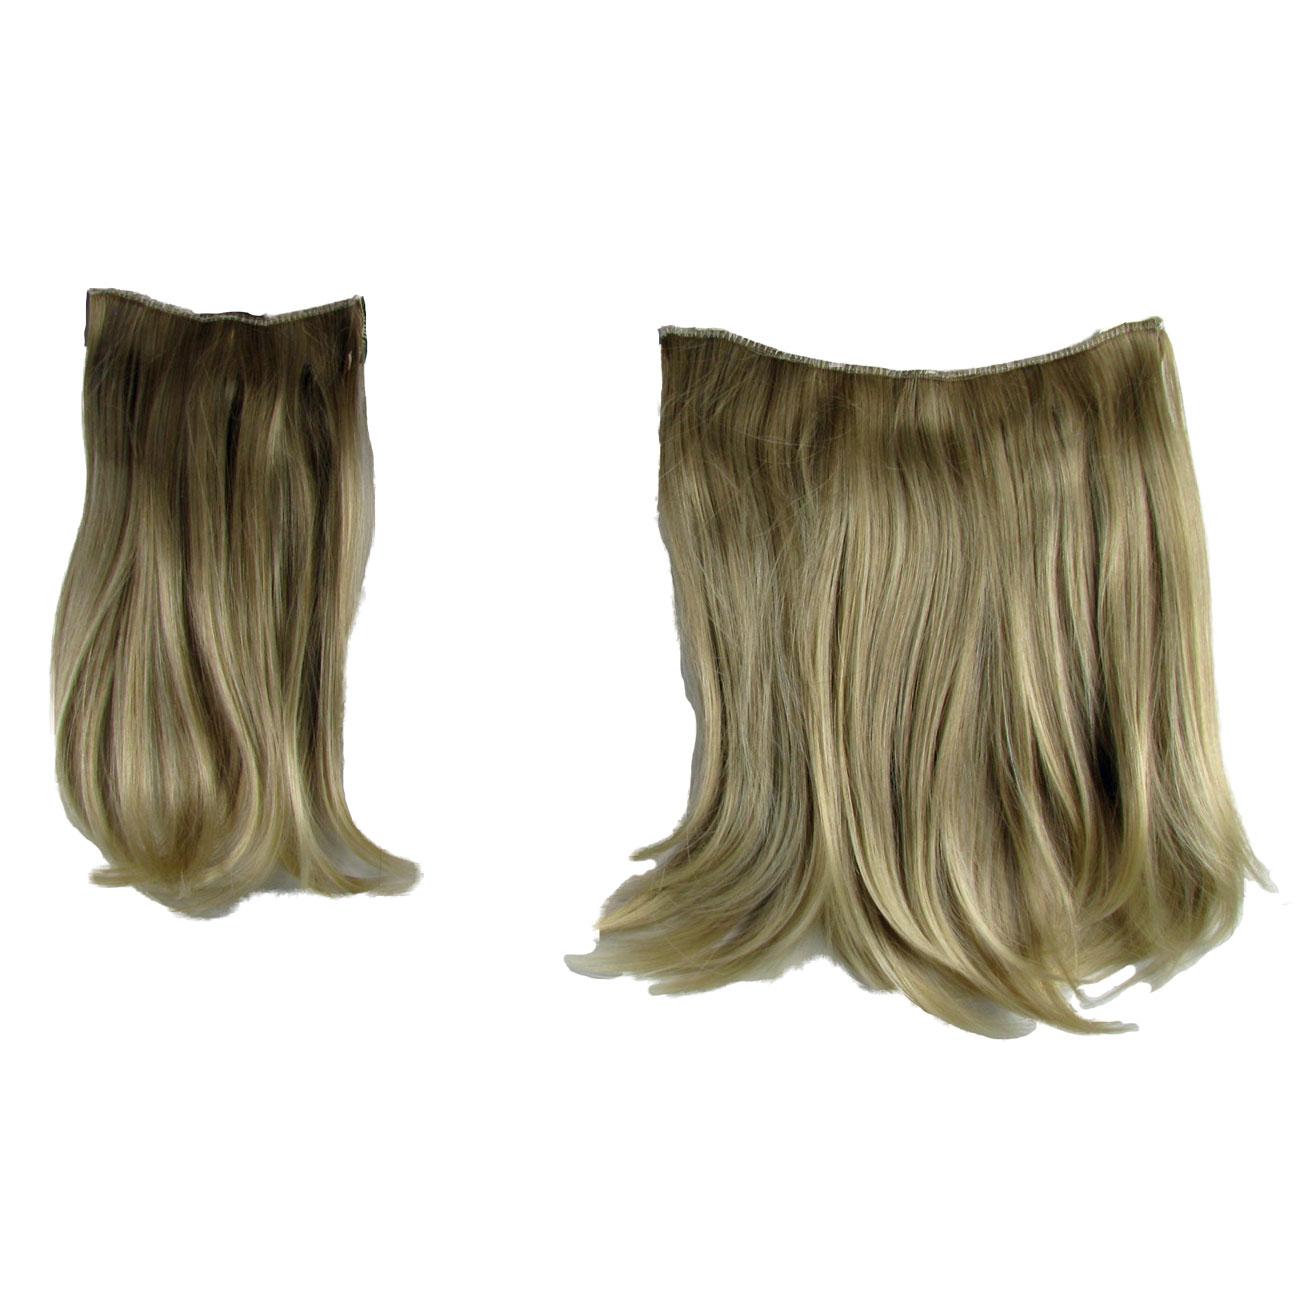 Sandy Blonde Extensions 57